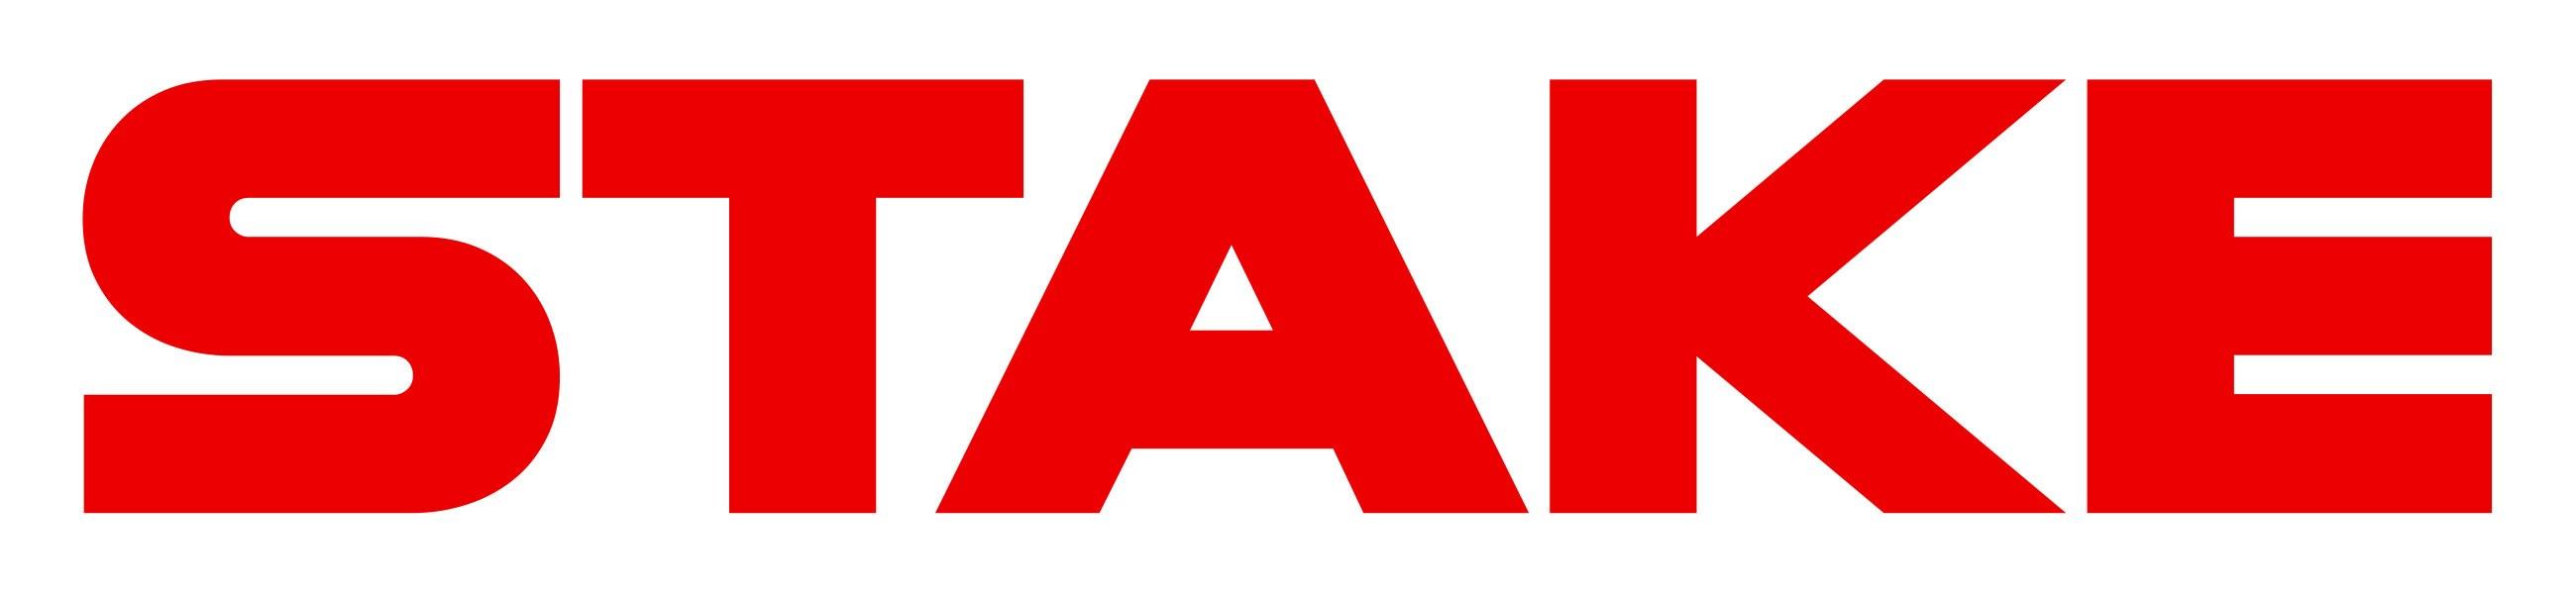 STAKE-logo_jpg_RGB.jpg